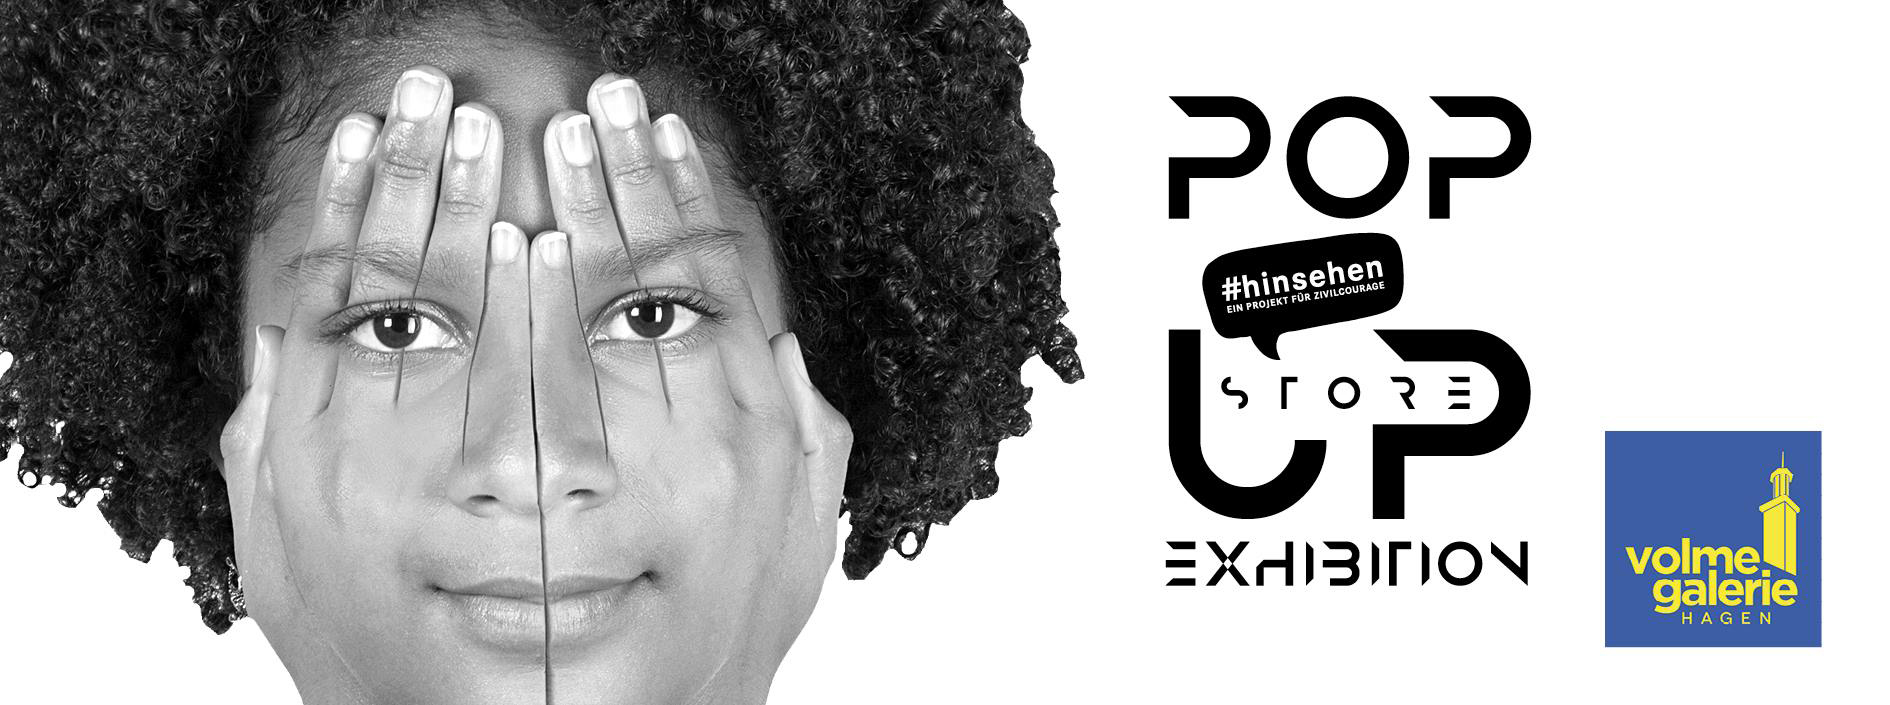 STATIONEN #hinsehen goes POP UP STORE – Beba Ilic – #hinsehen